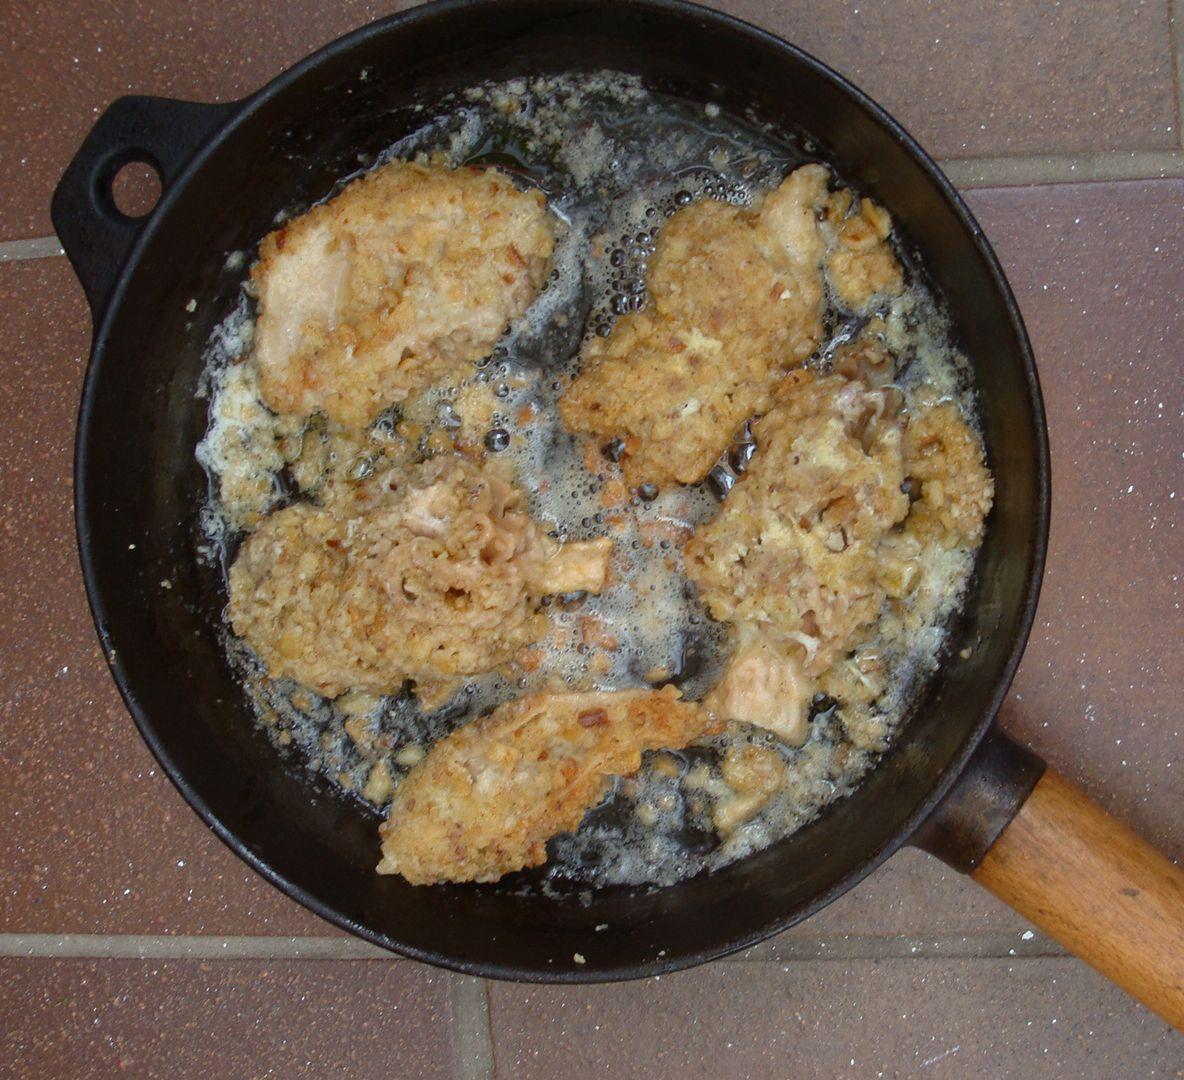 Morels American Style, with Morchella Esculenta. Recipe from Roger's Mushrooms App l  #mushroom #fungi #recipe #morel #morchella l www.rogersmushrooms.com